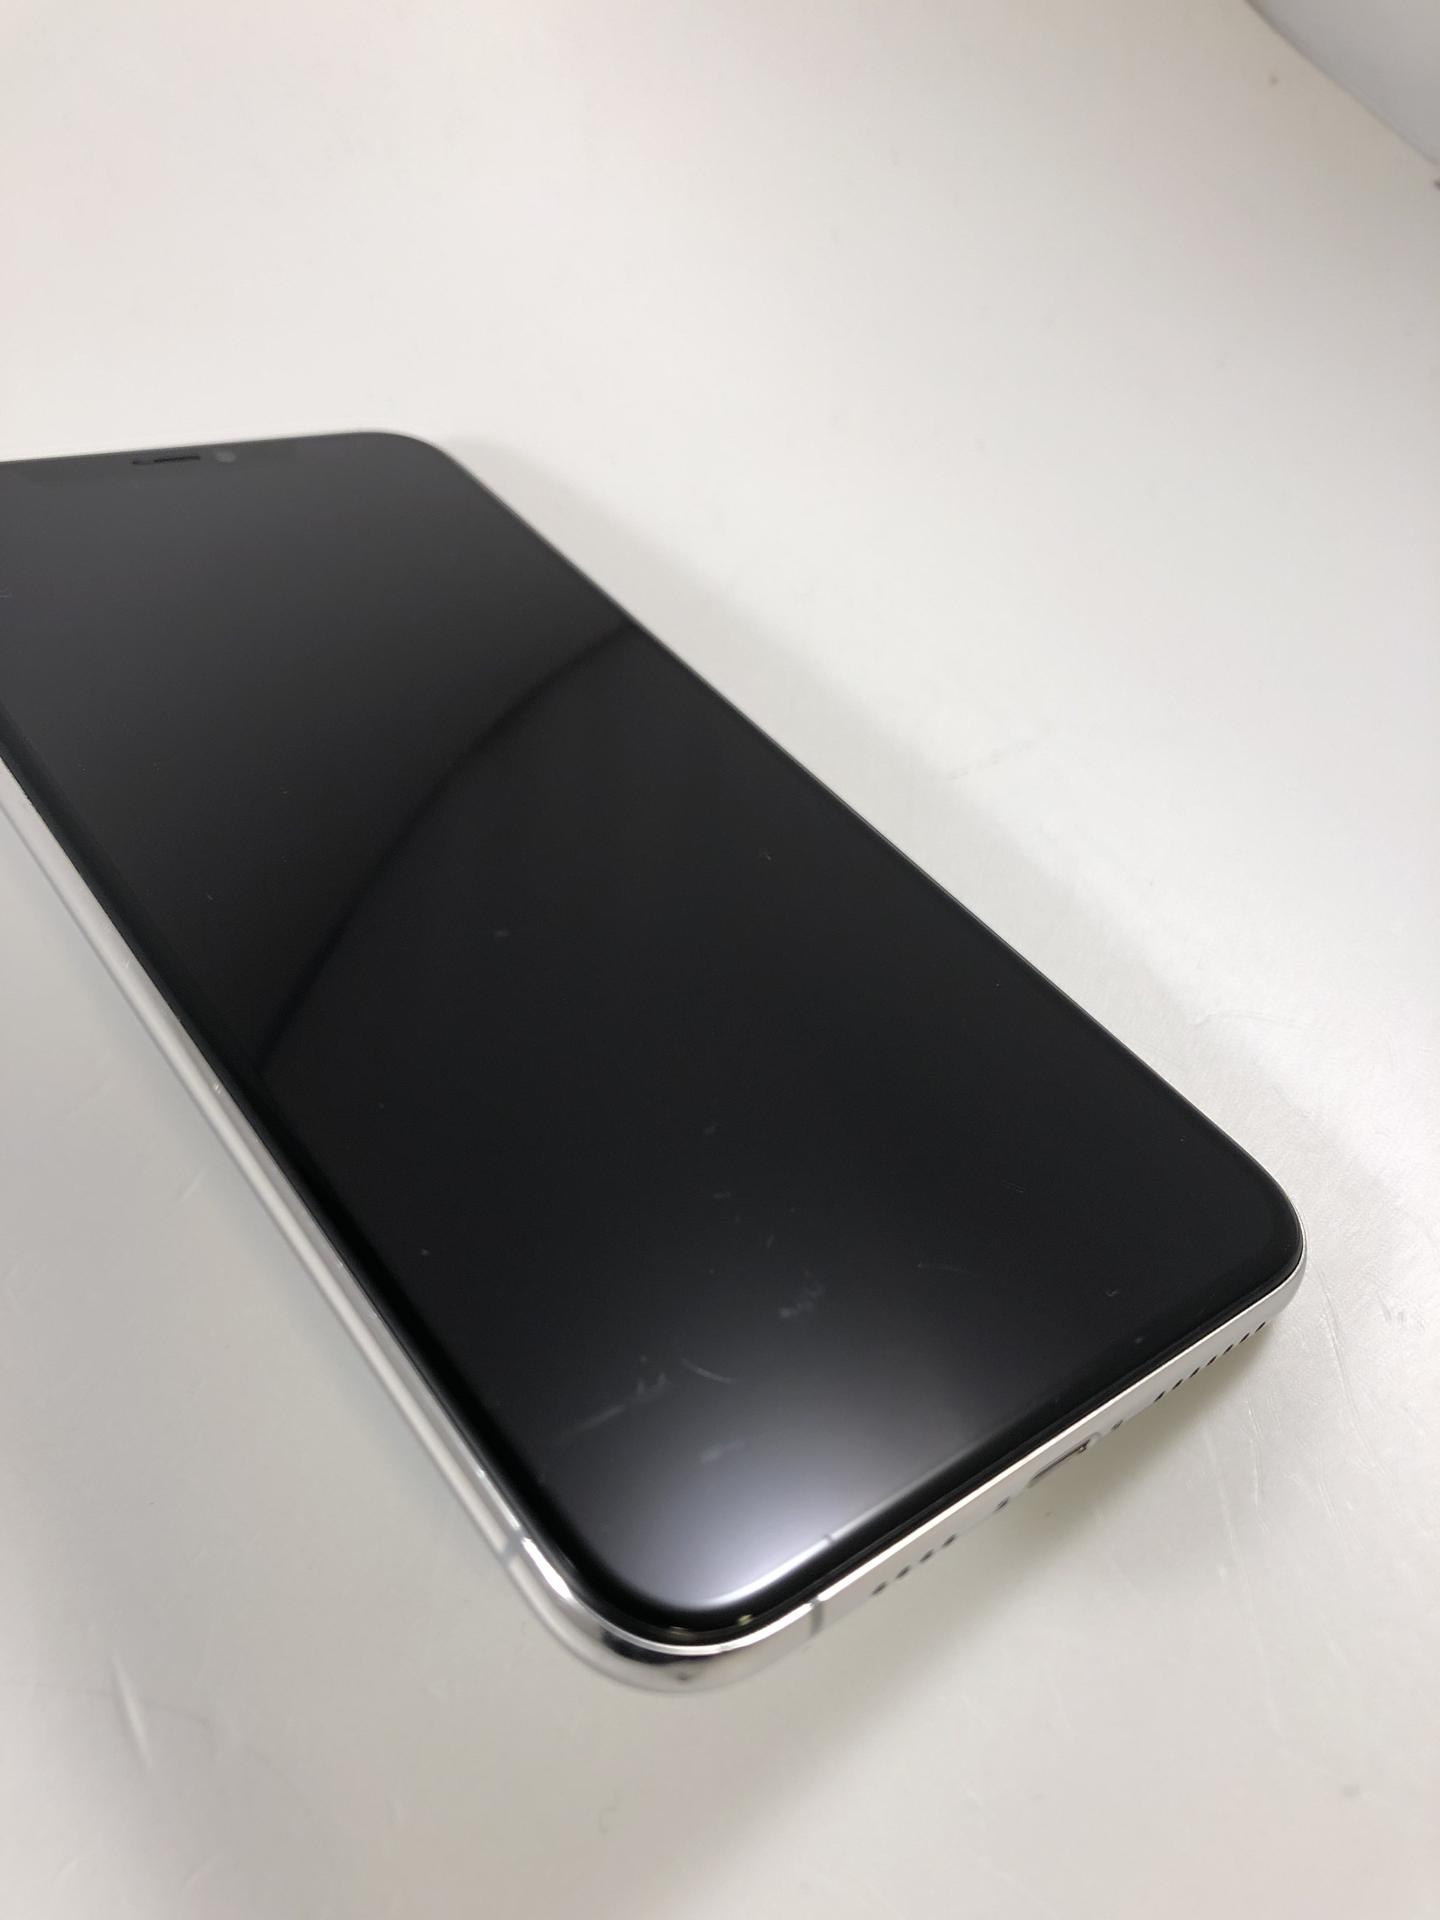 iPhone XS Max 256GB, 256GB, Silver, immagine 3